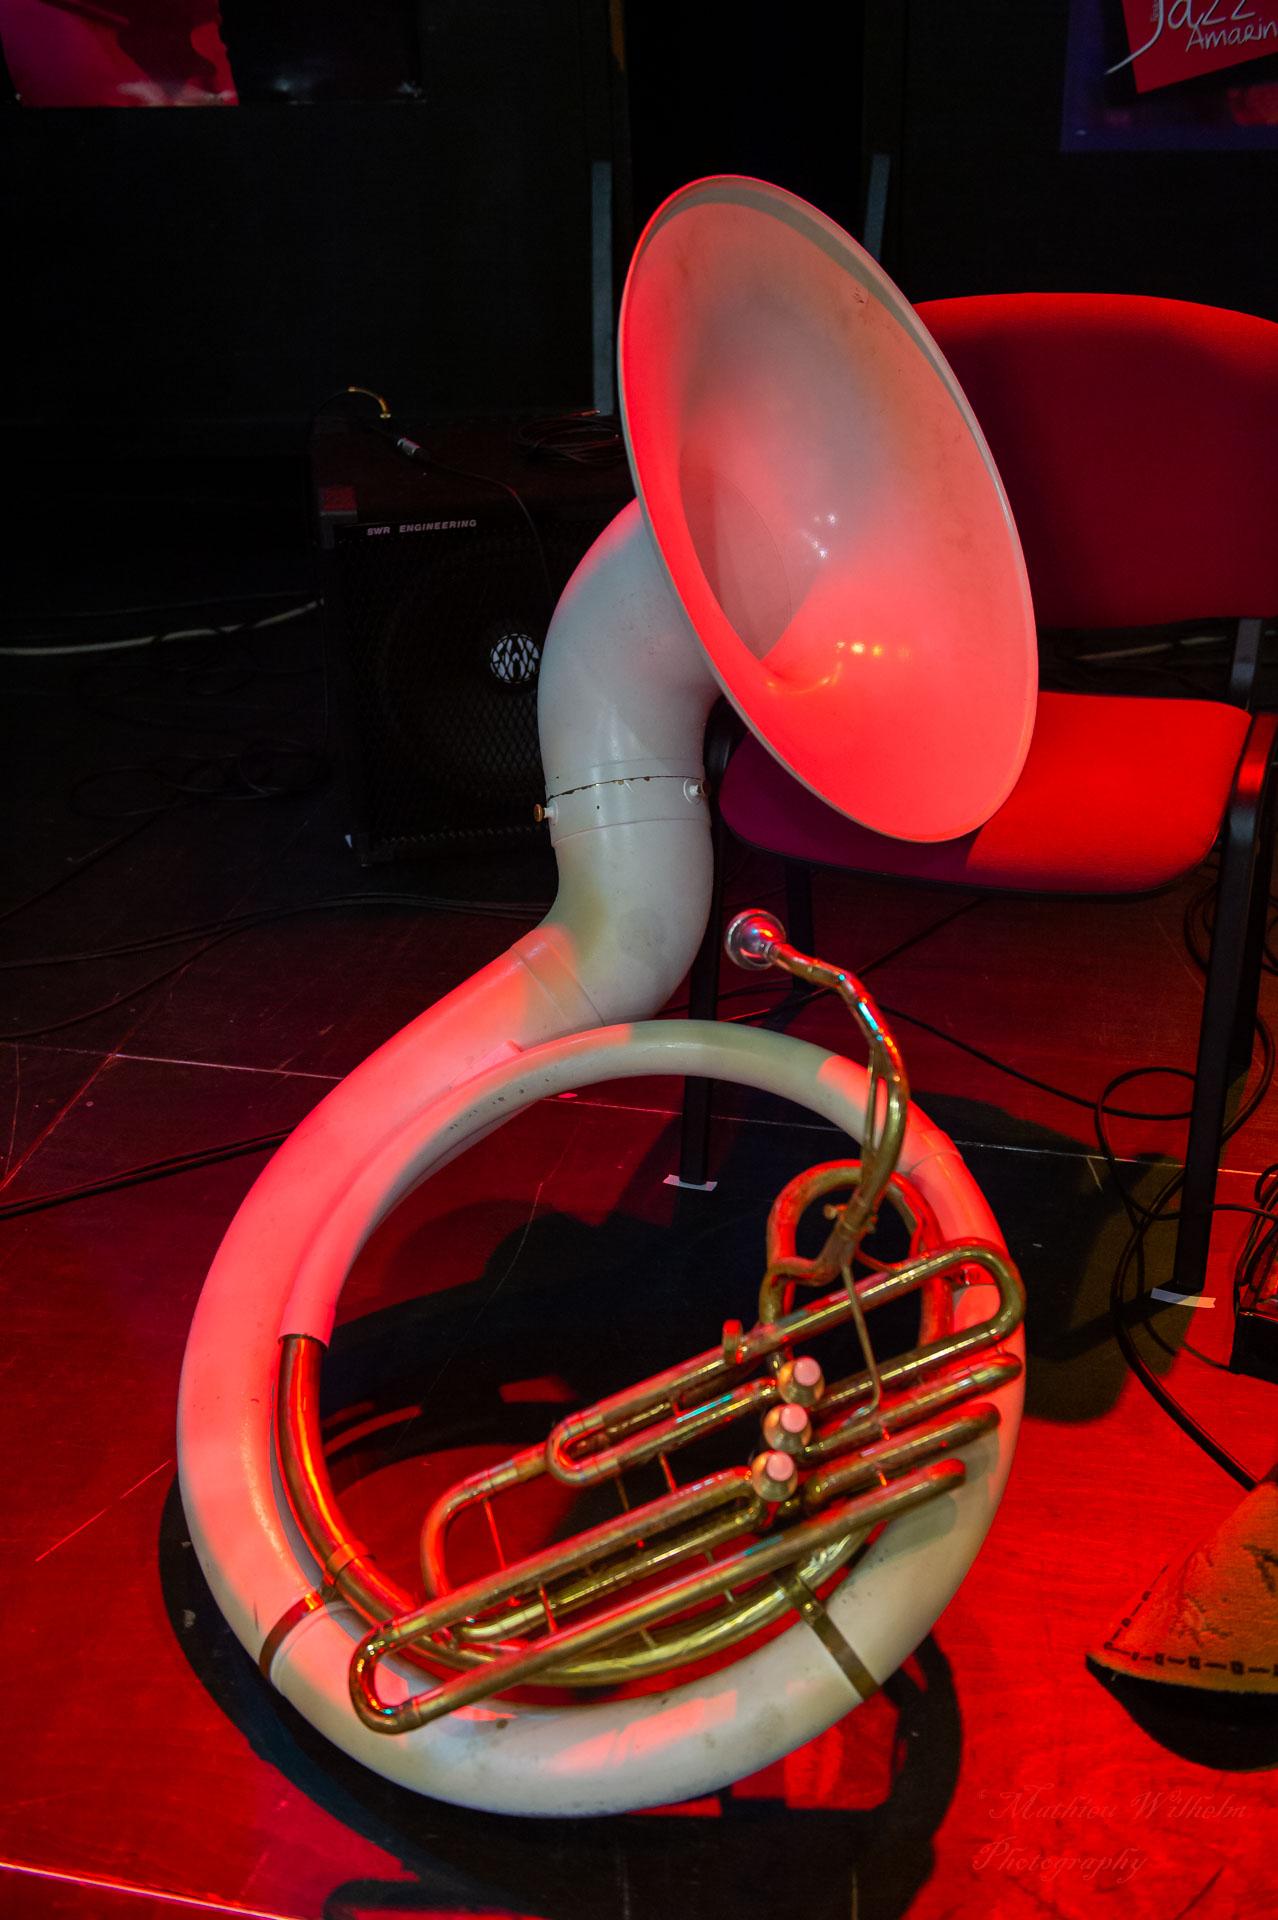 2019-10-26 Jazz Amarinois (122)